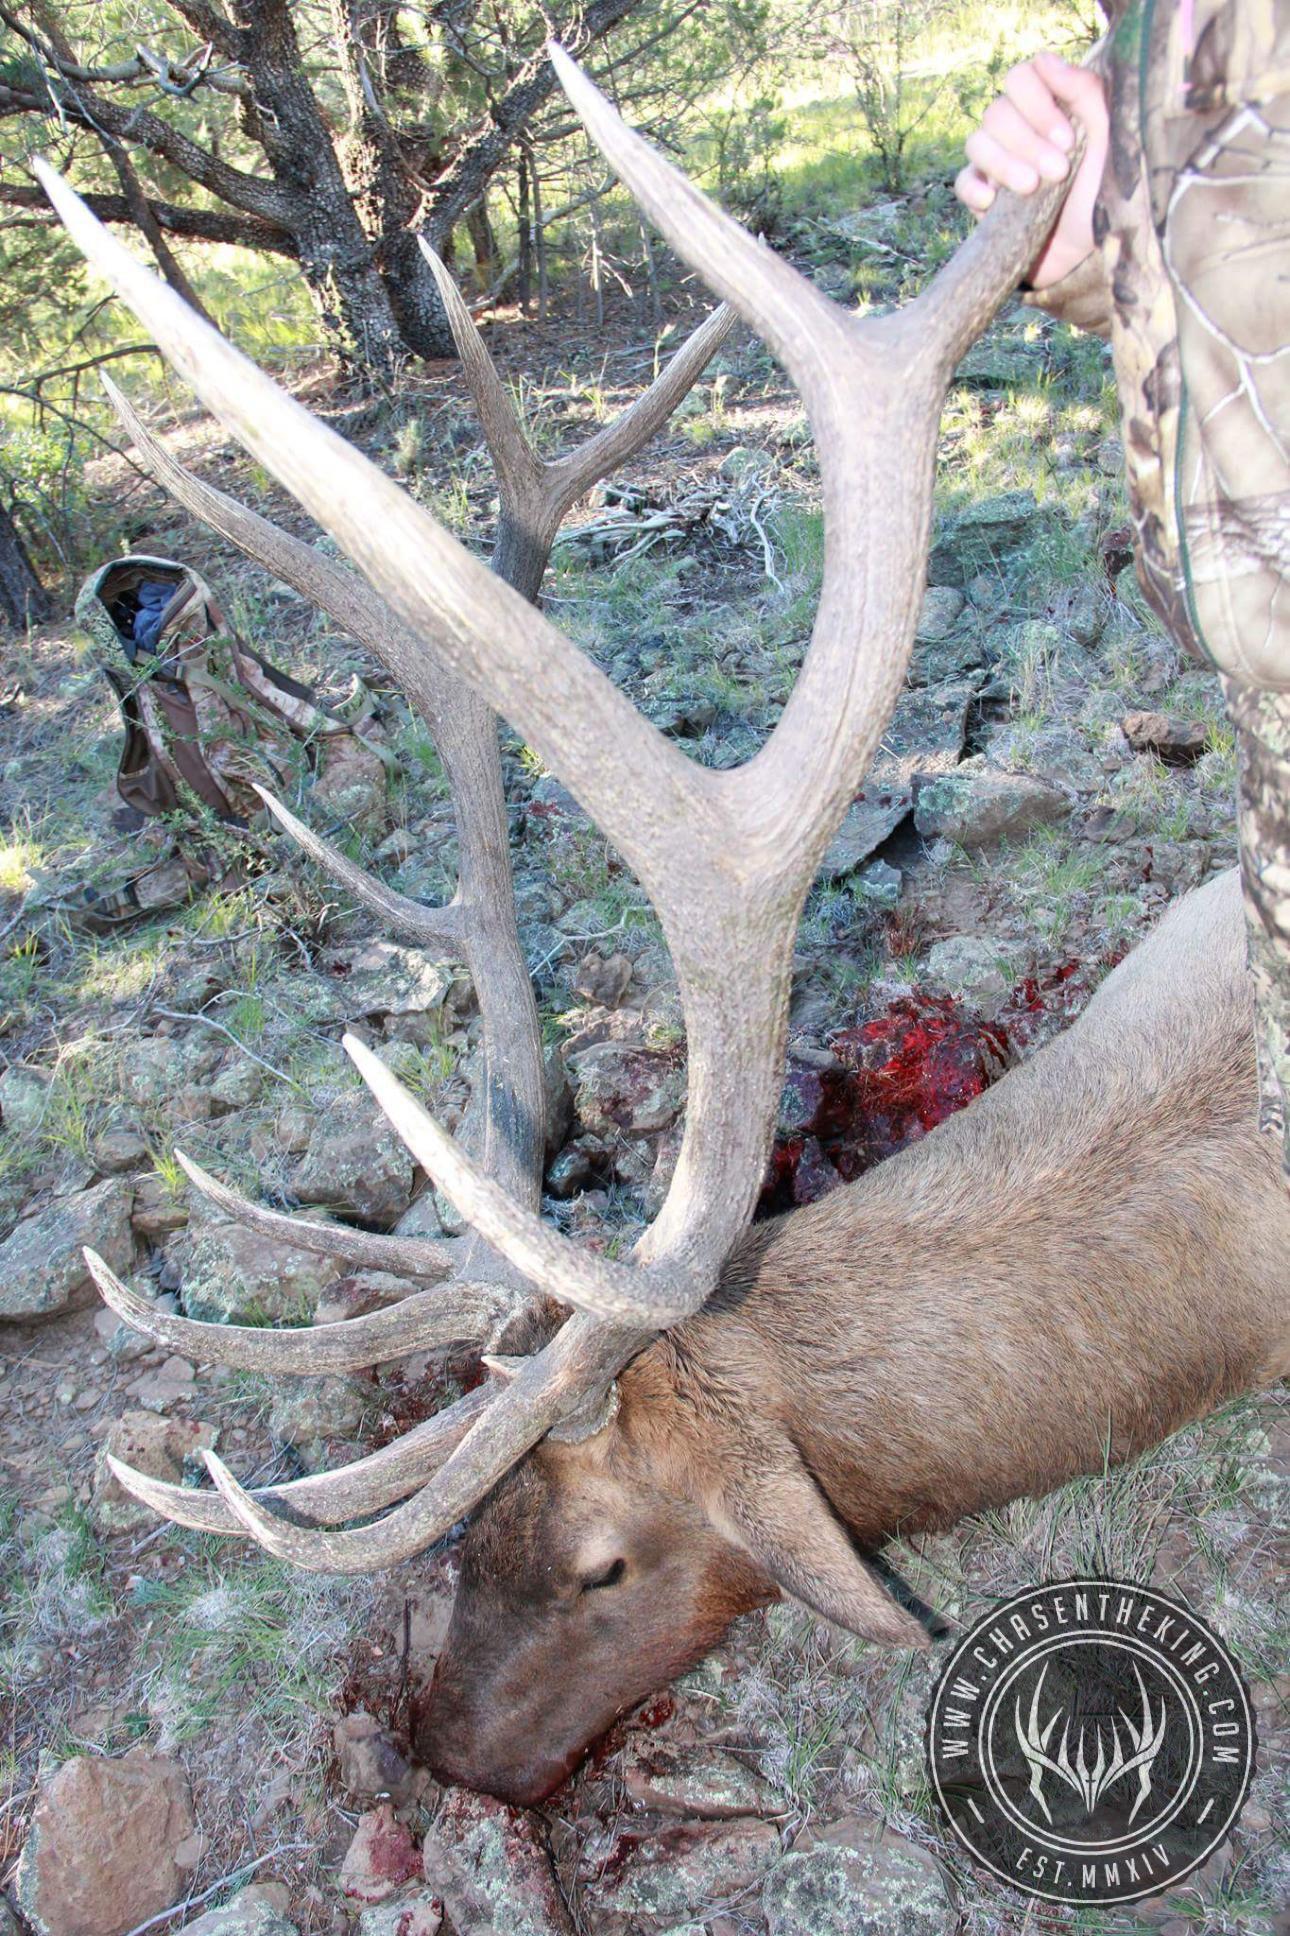 Unit 6A early archery bull elk 3